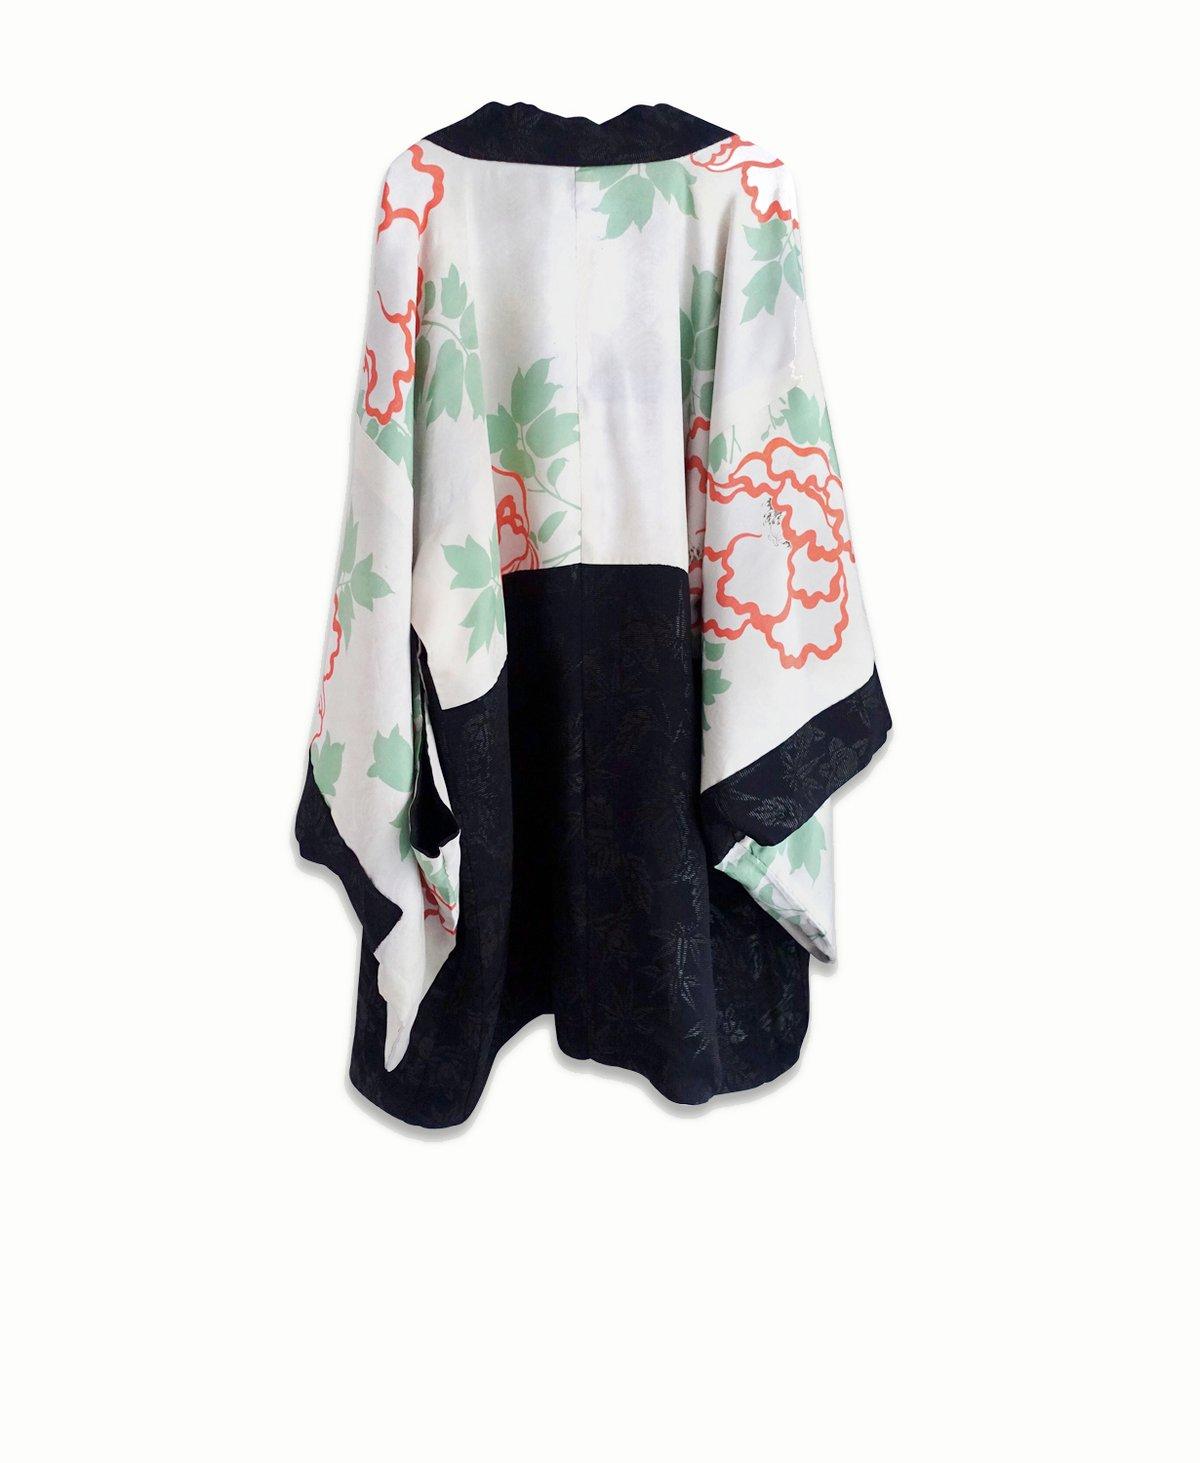 Image of NY: Kort kimono sort/blomstret med Urushi blade og peoner